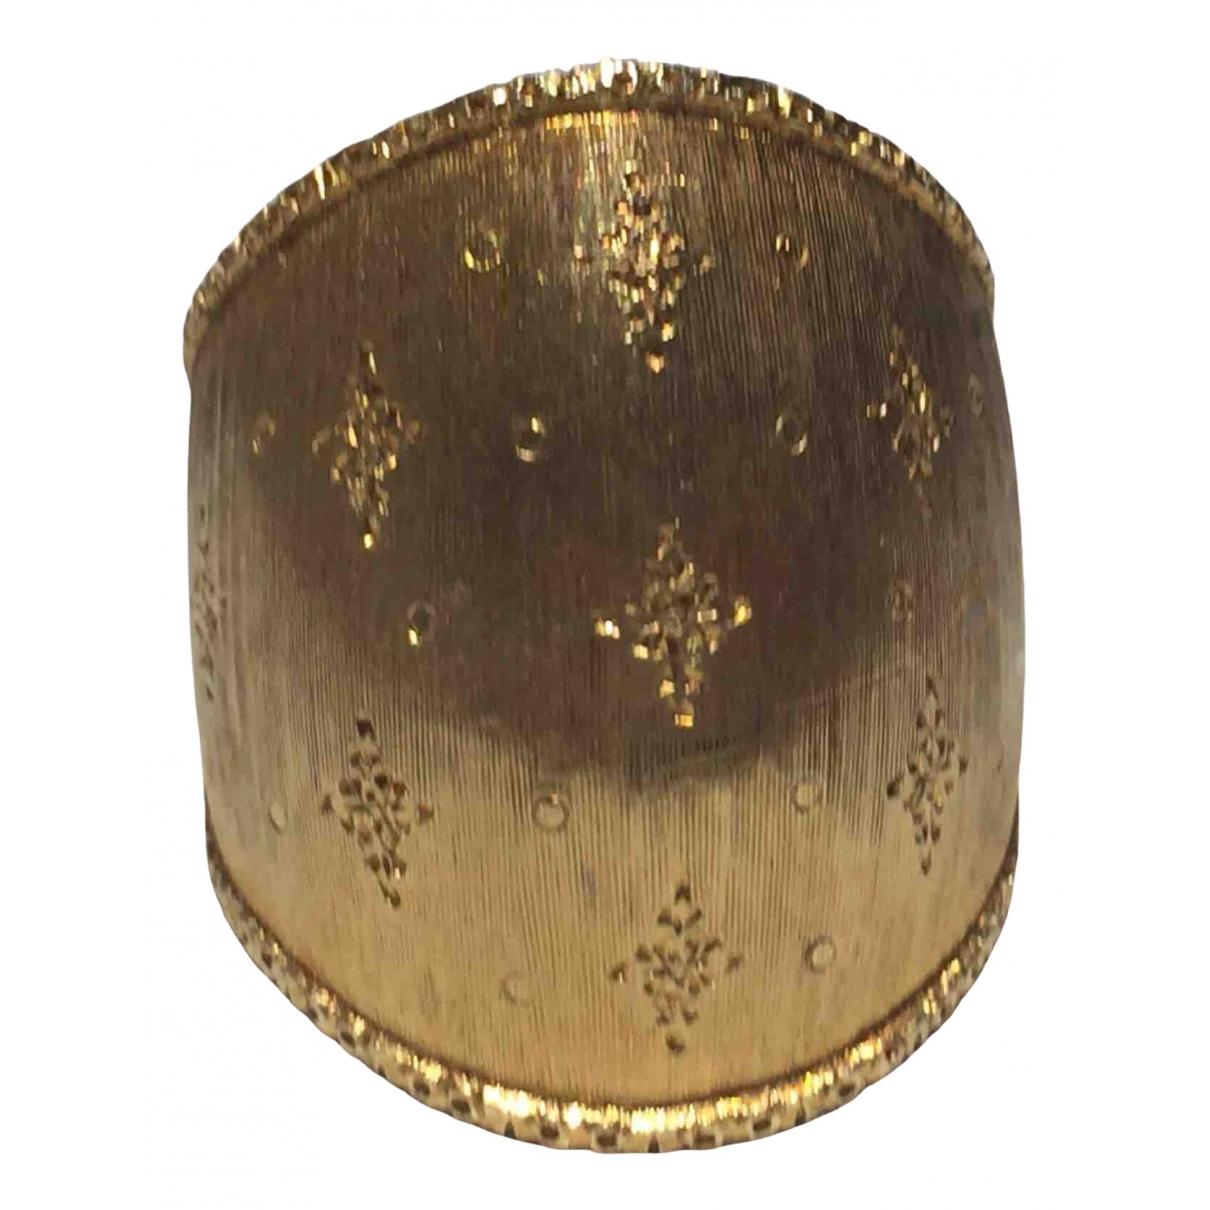 Buccellati - Bague   pour femme en or jaune - jaune